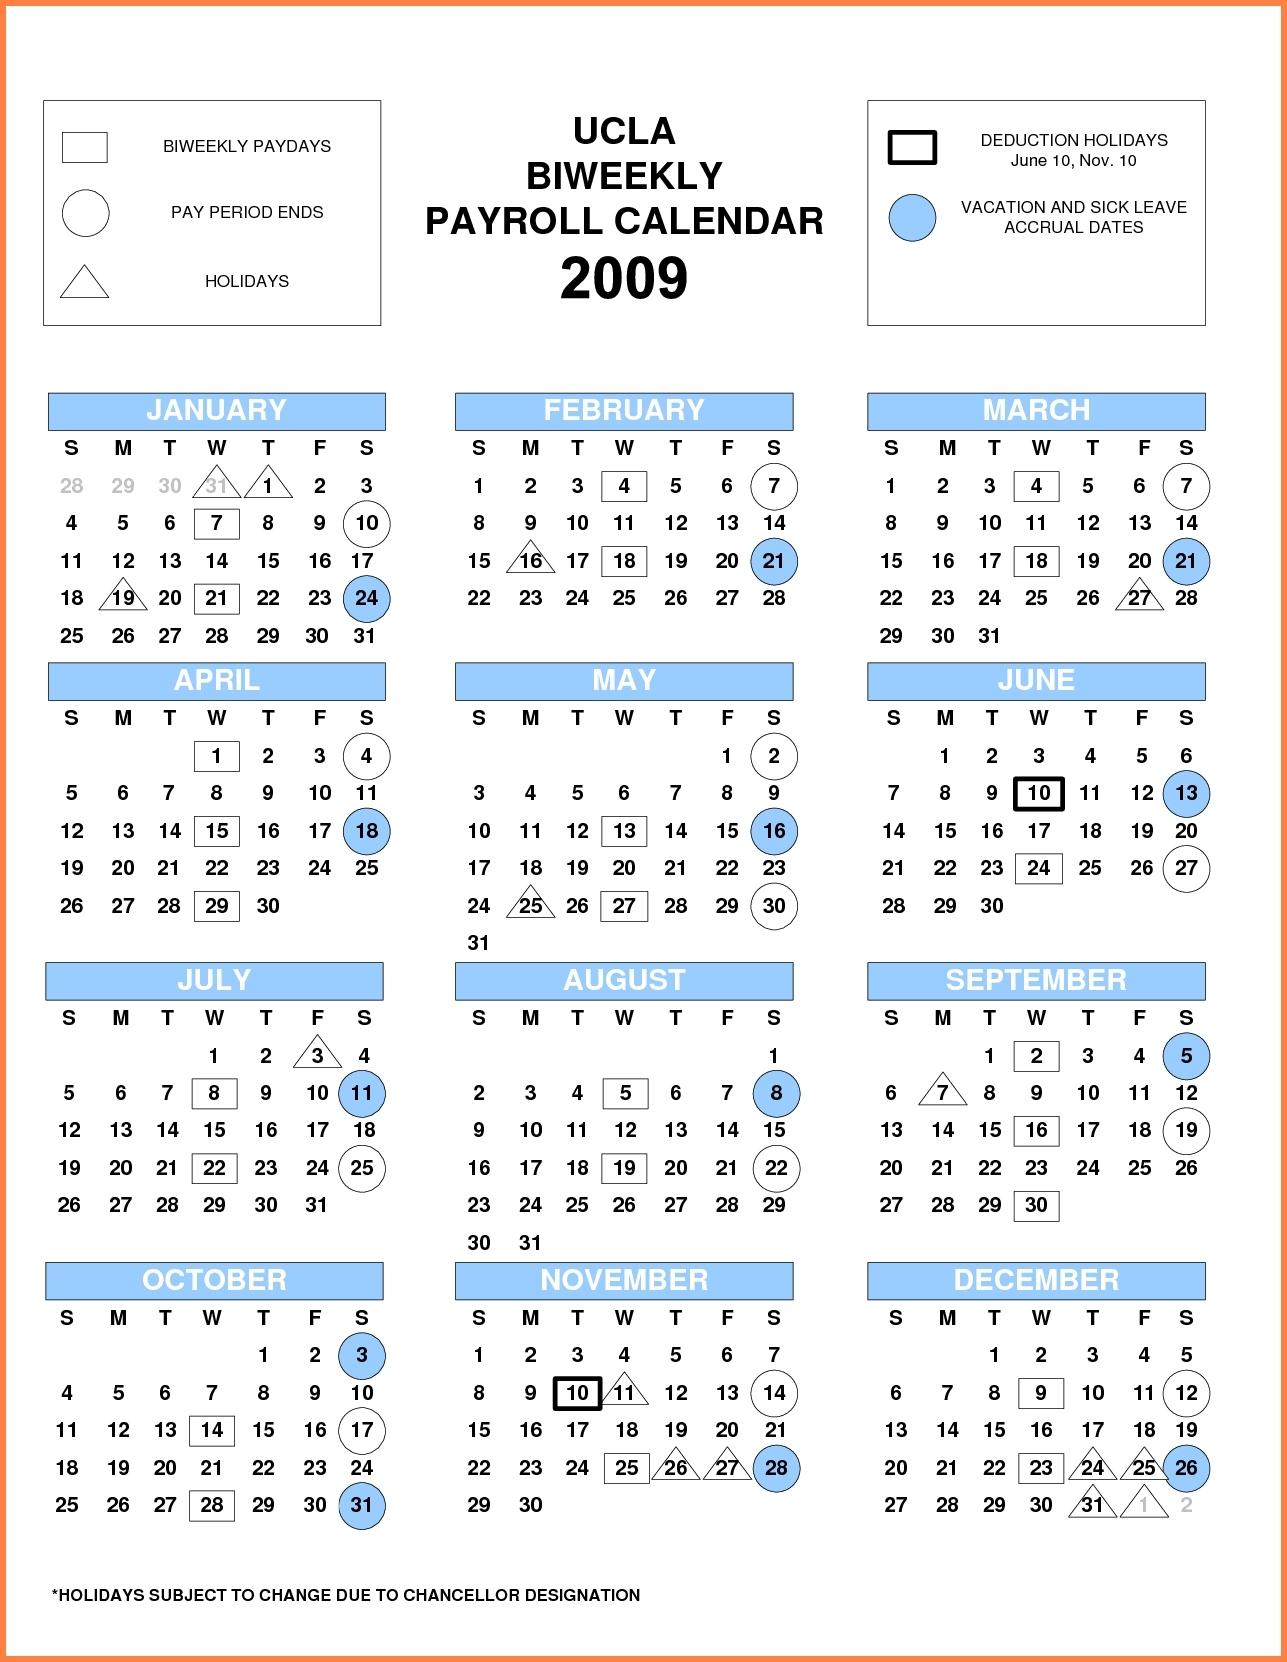 025 Bi Weekly Pay Calendar Template Payroll Calendars-Template For Semi Monthly Payroll Calendar 2020